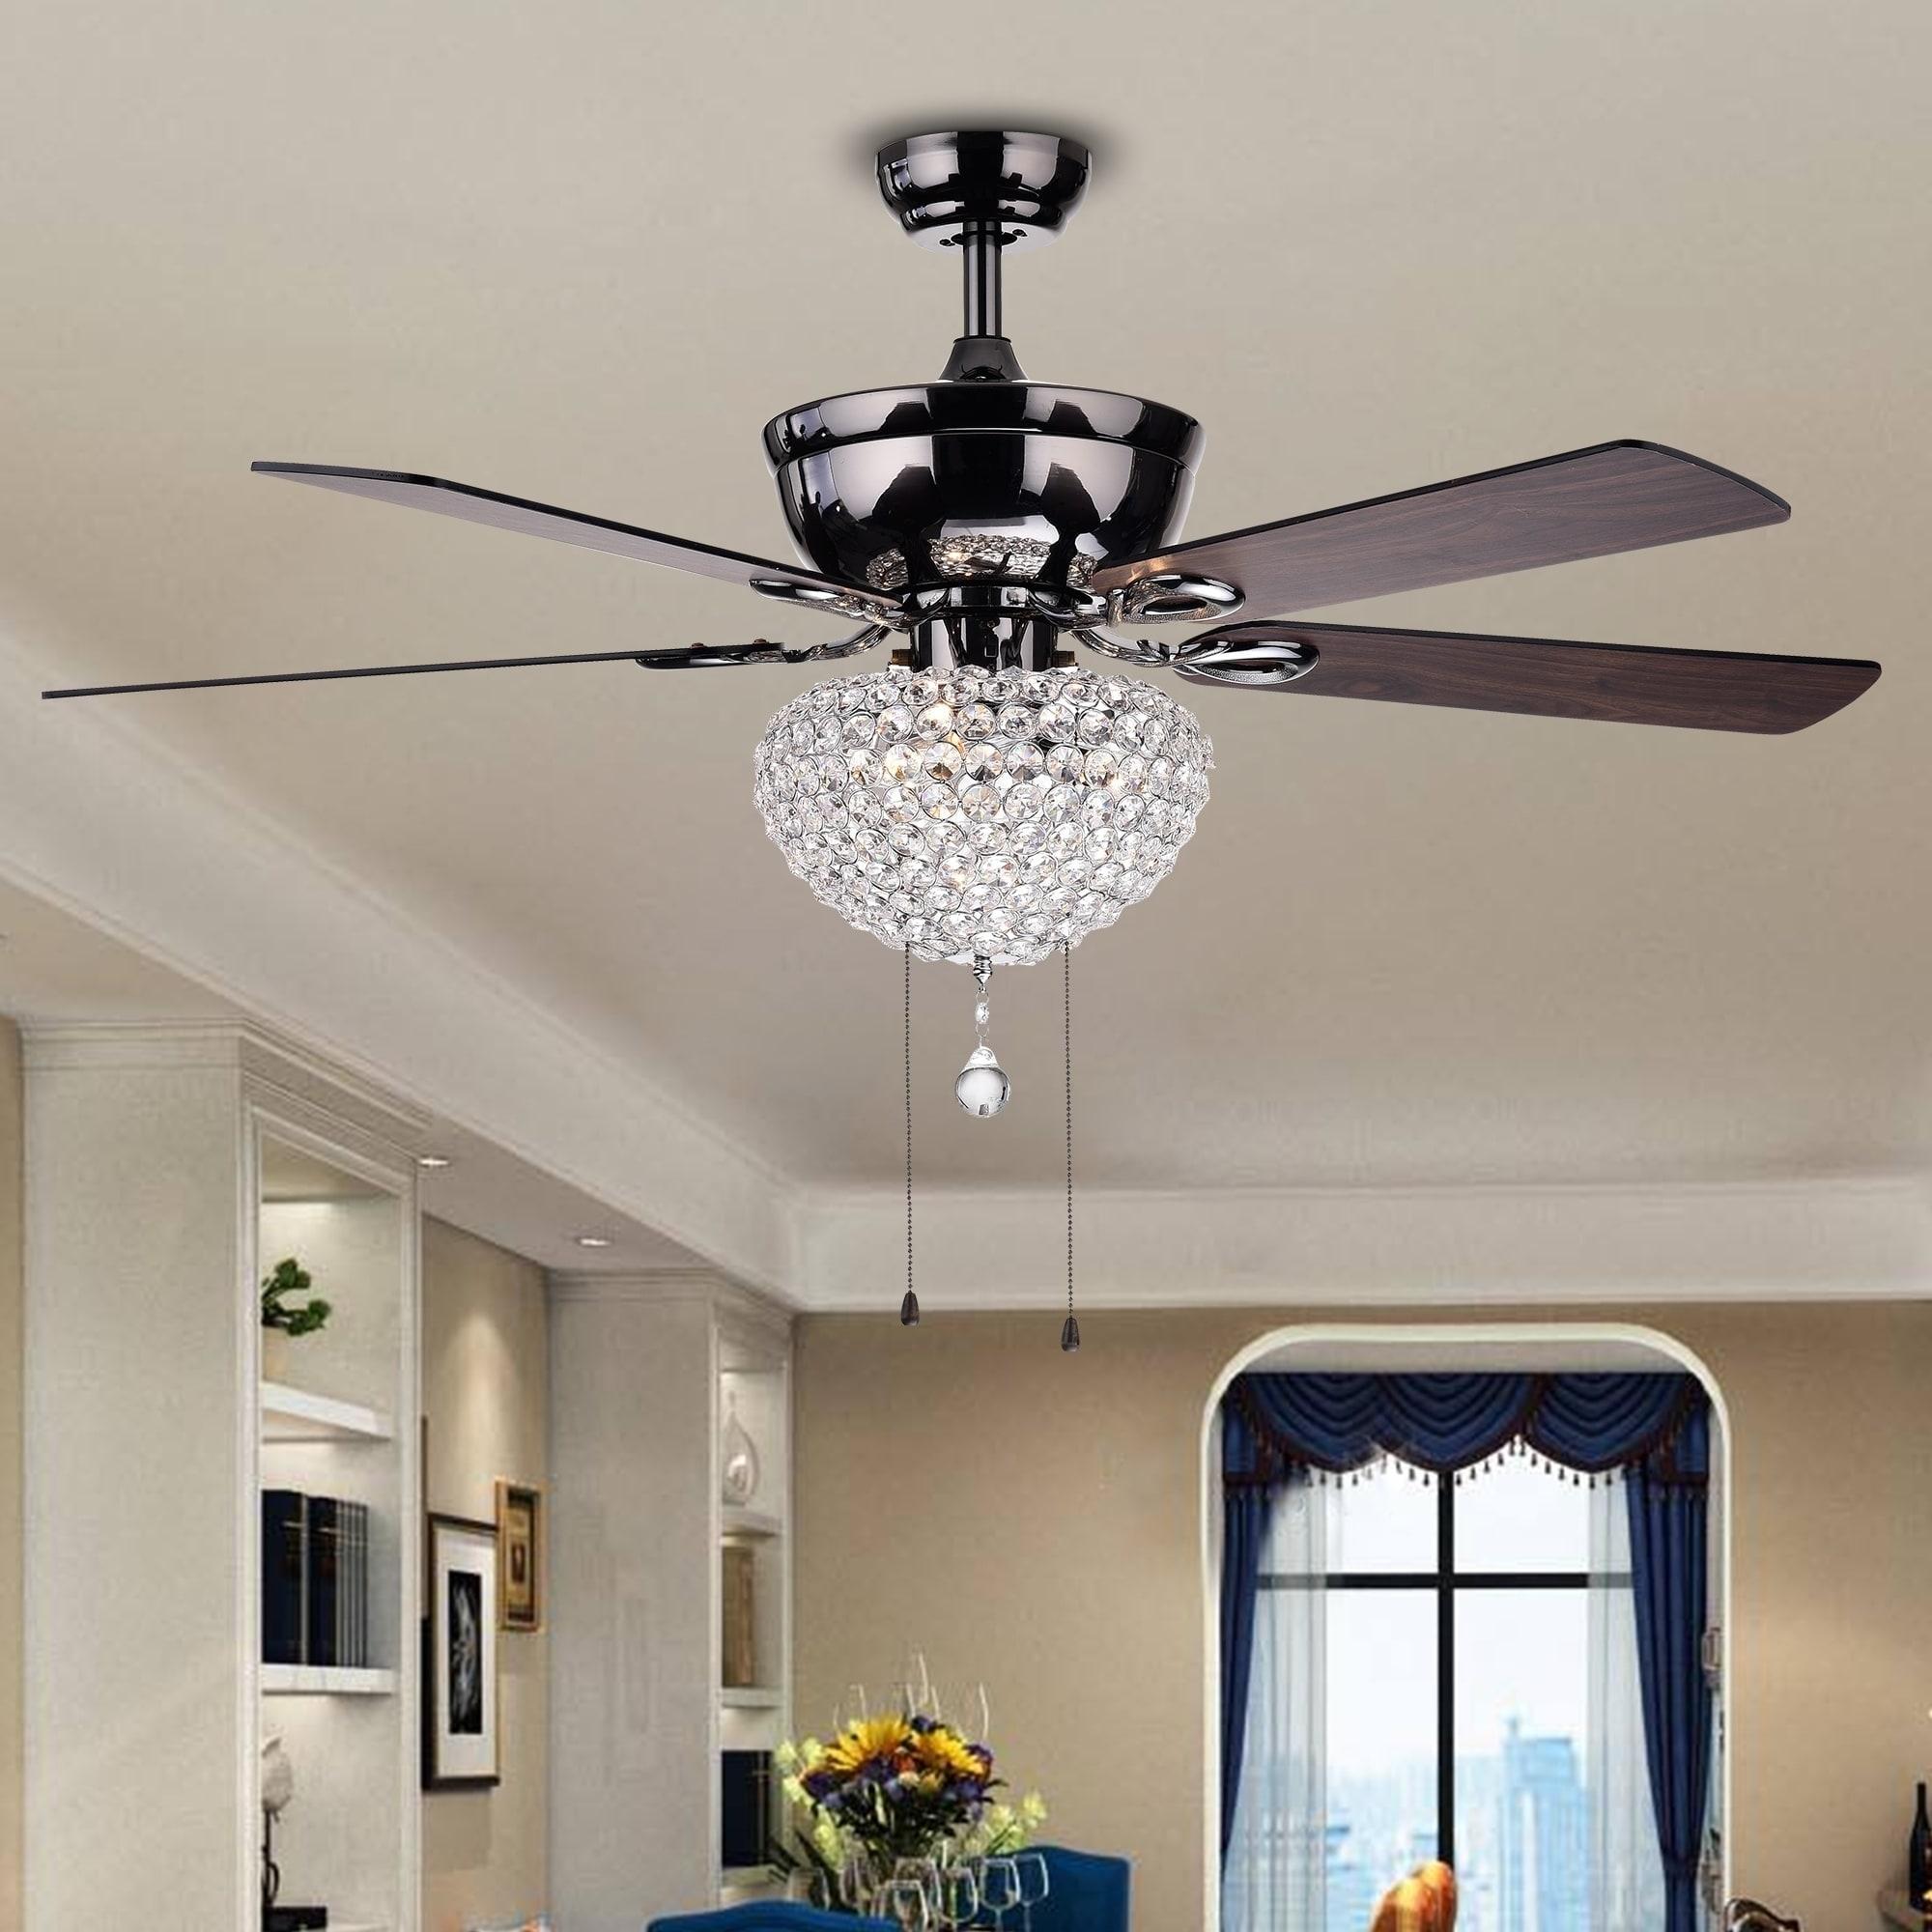 891a83432c178 Taliko 3-light Crystal Basket 5-blade Wood w/ Black Metal Housing 52-inch  Ceiling Fan (Optional Remote & 2 Color Option Blades)